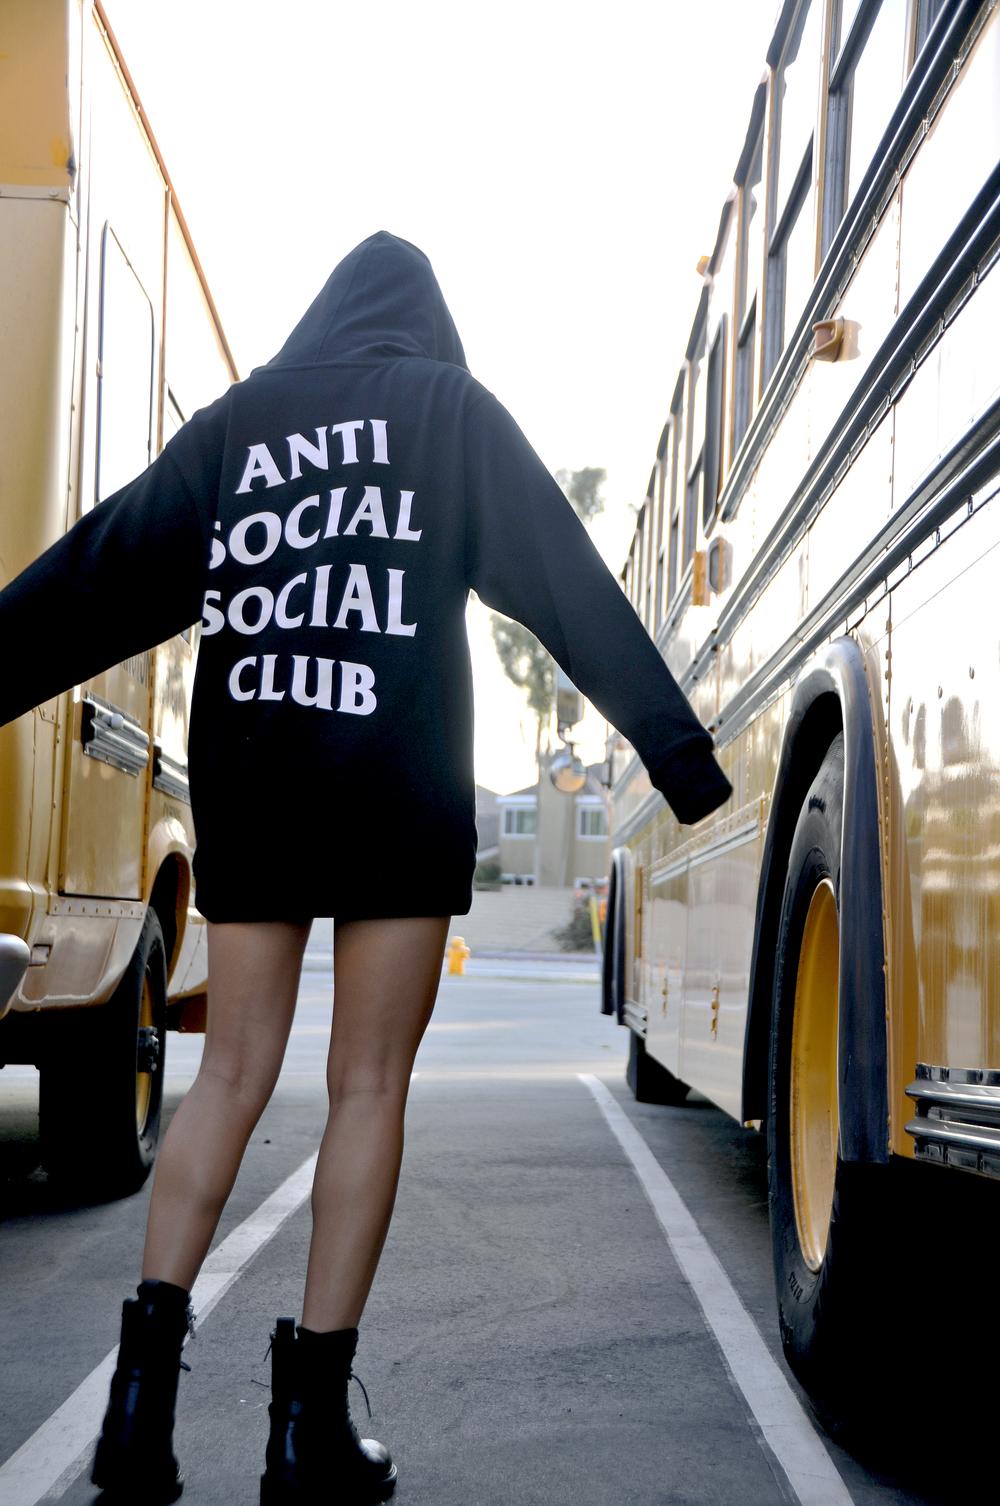 antisocial_bus_3